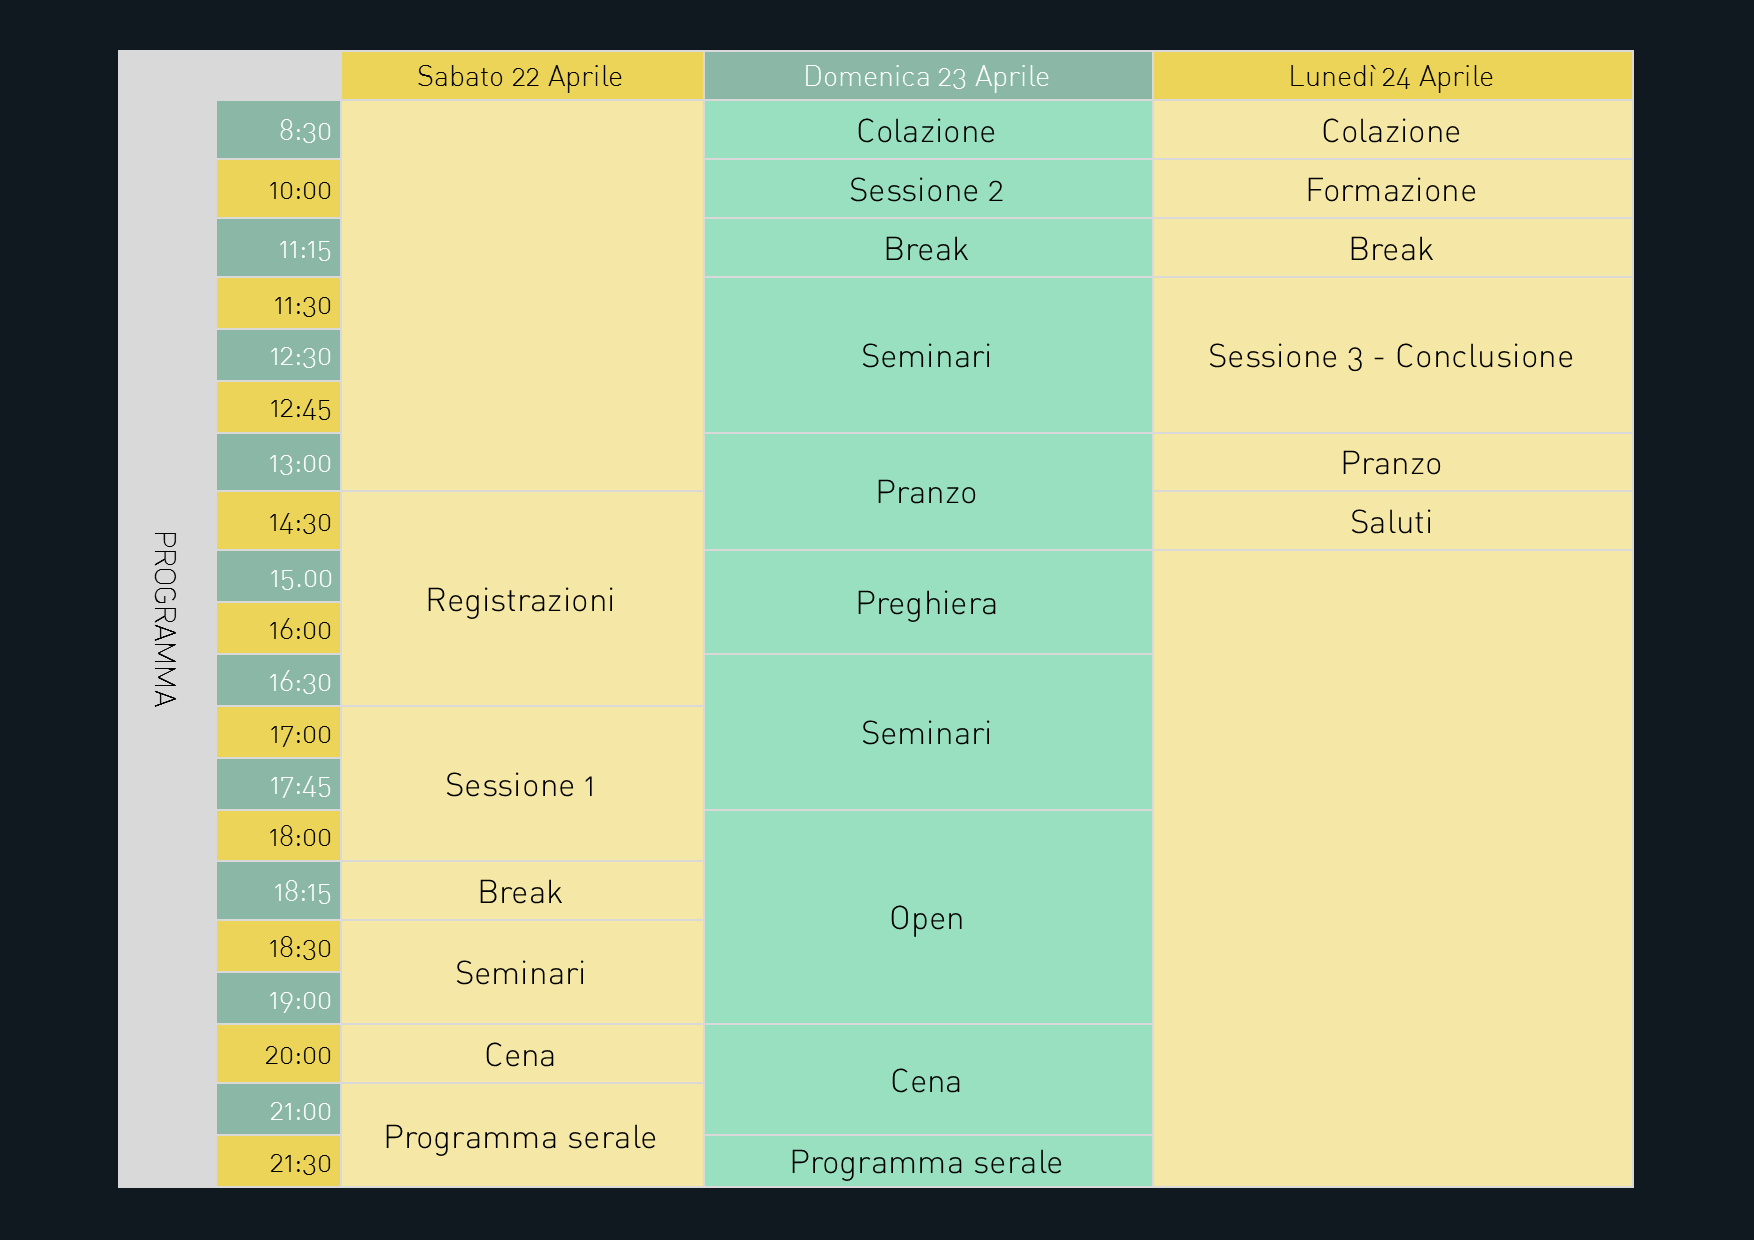 Programma a5 per sito.png